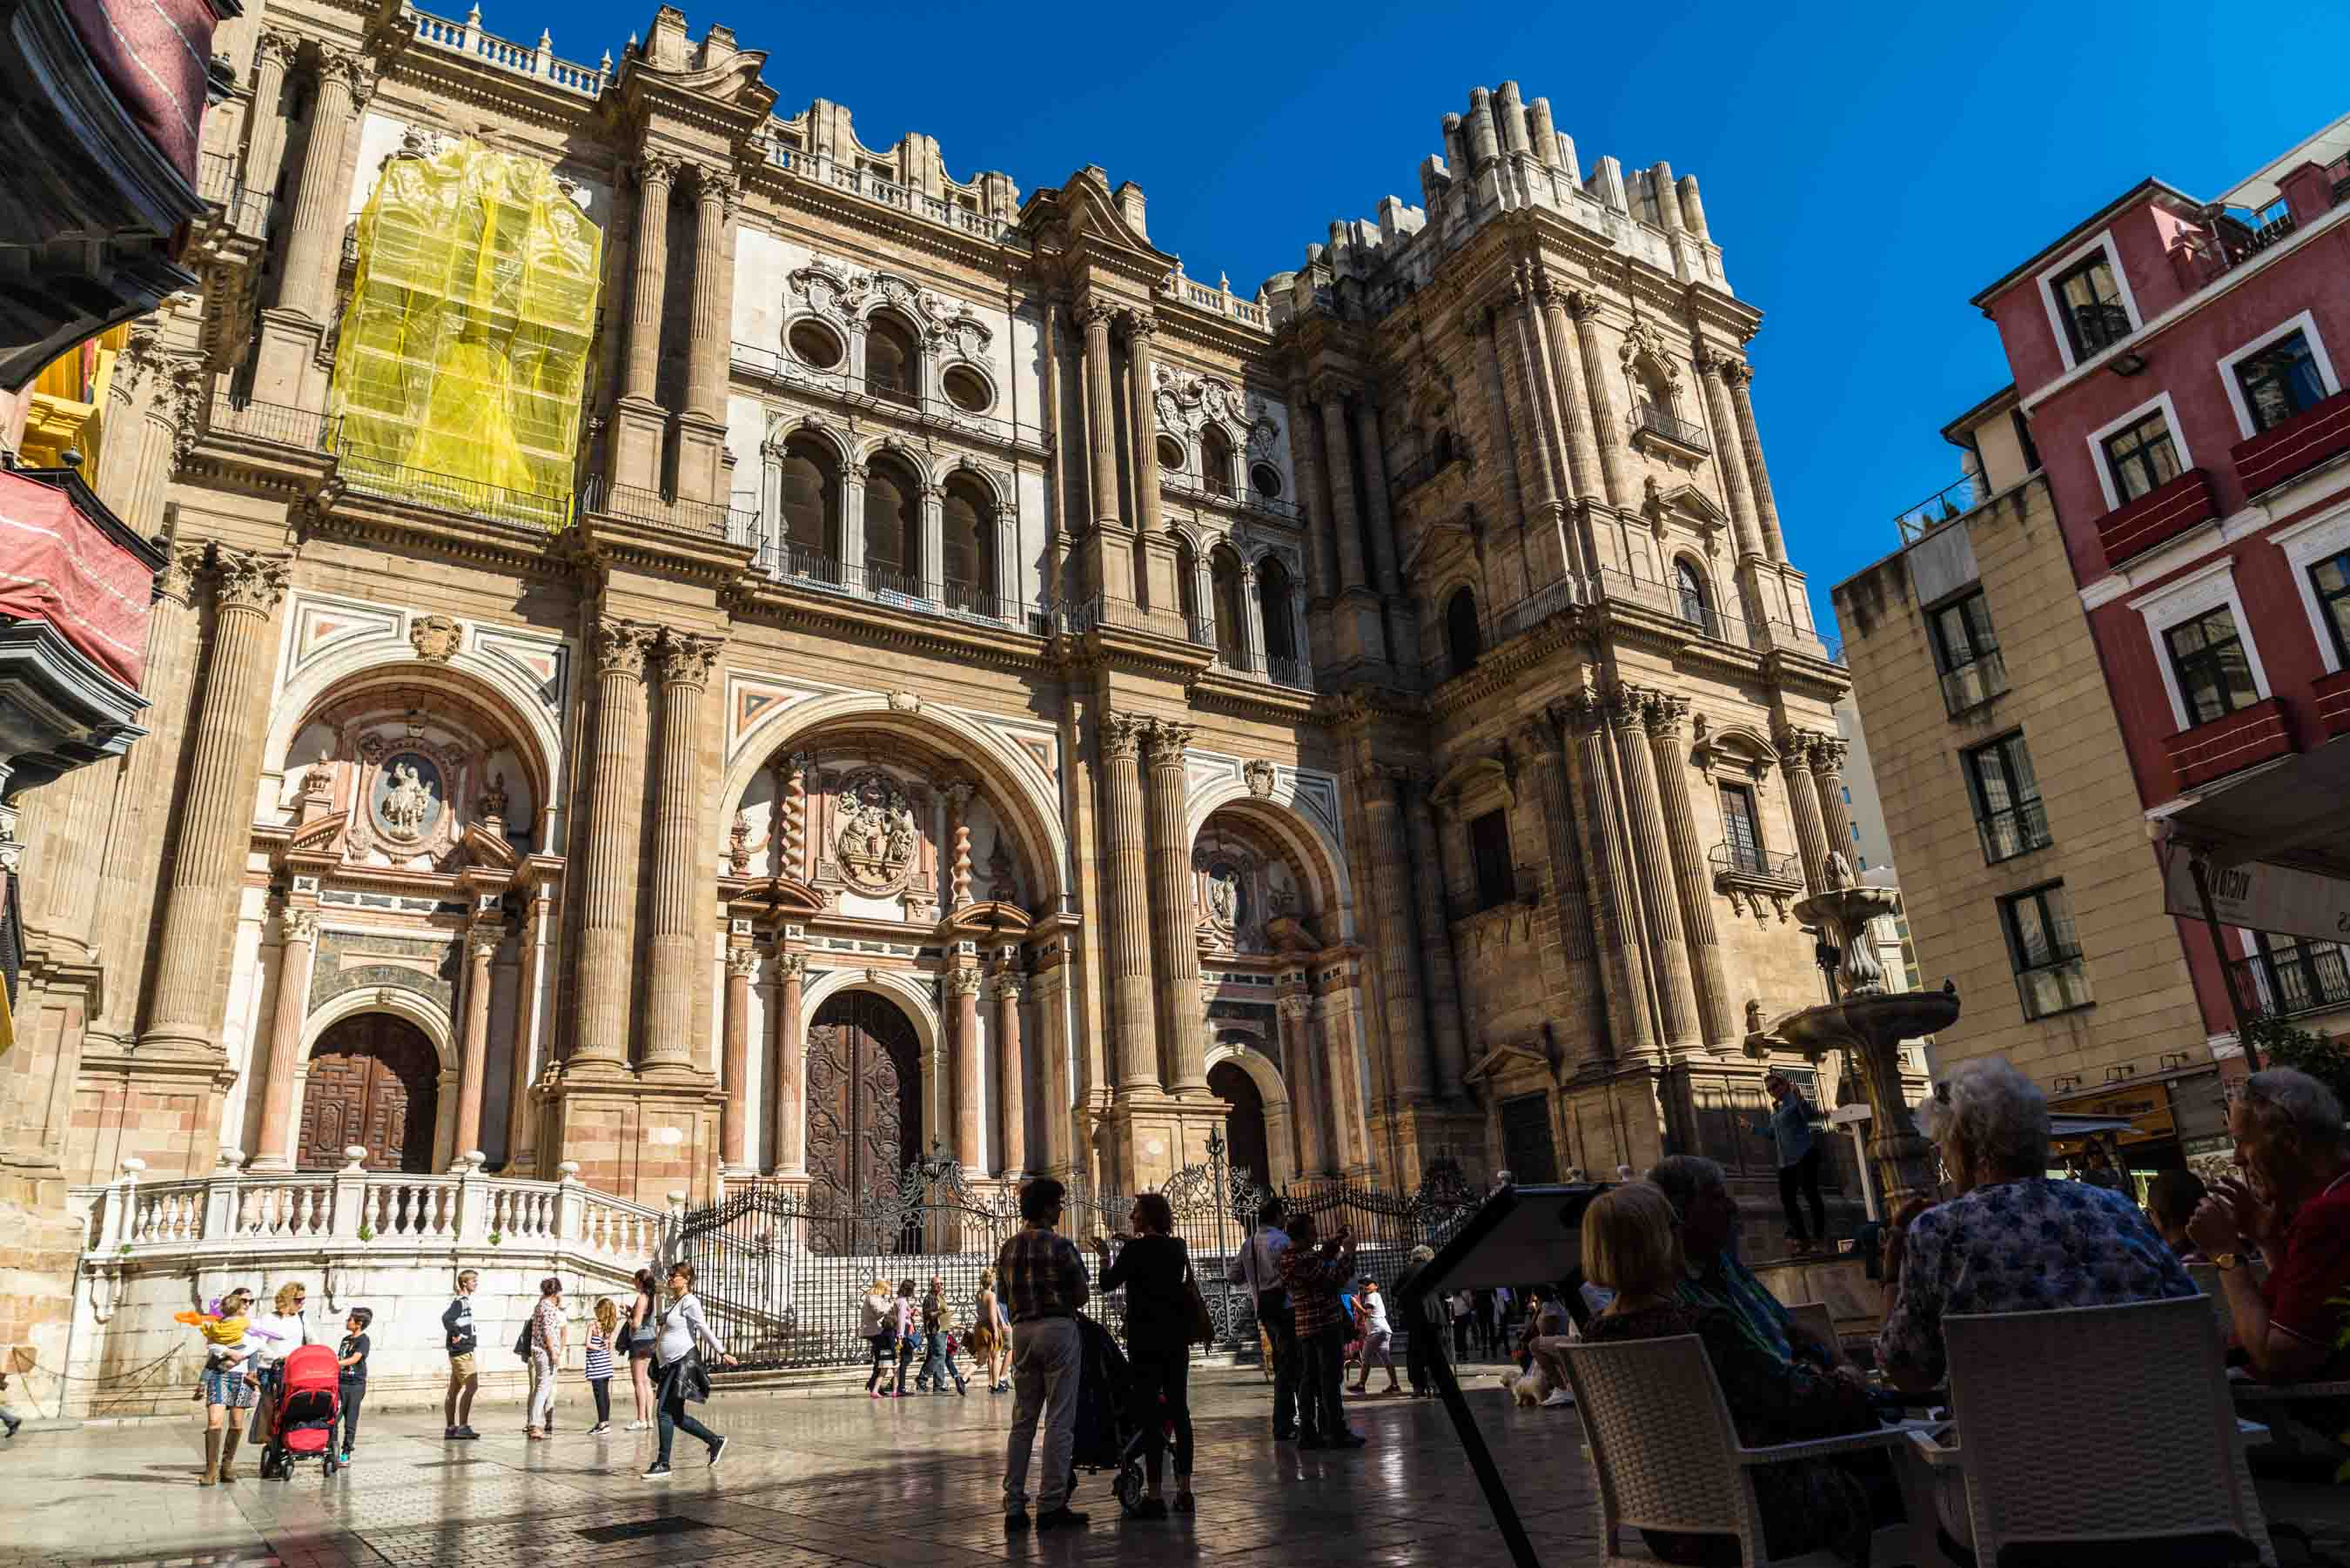 Malaga Spain - Cathedral